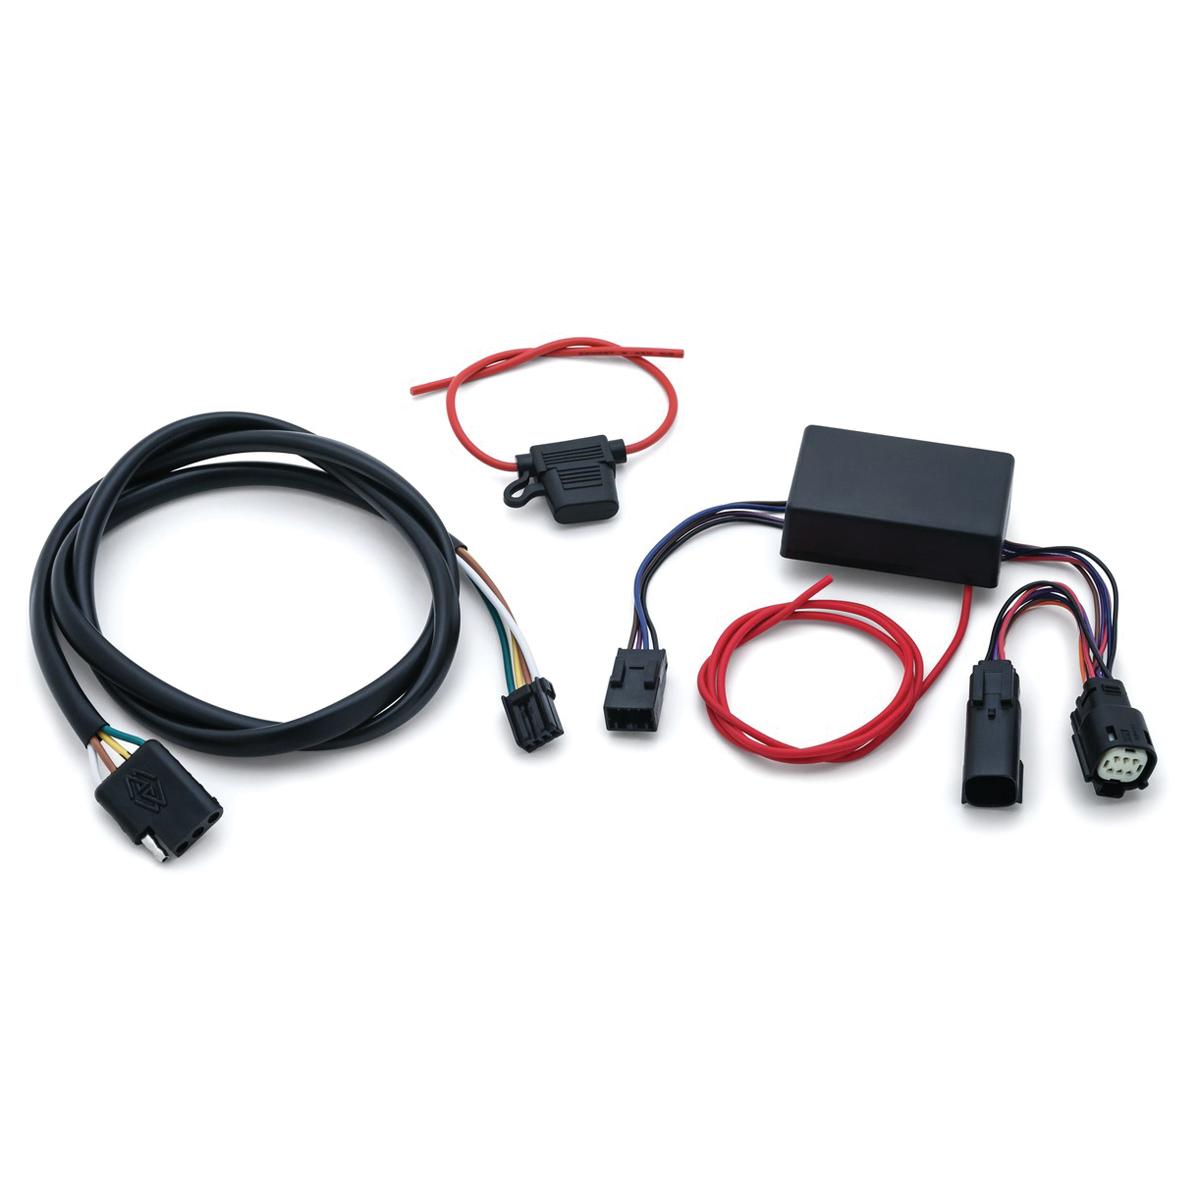 Kuryakyn 5-Wire Trailer Hitch Wiring Kit | 912-120 | J&P Cycles